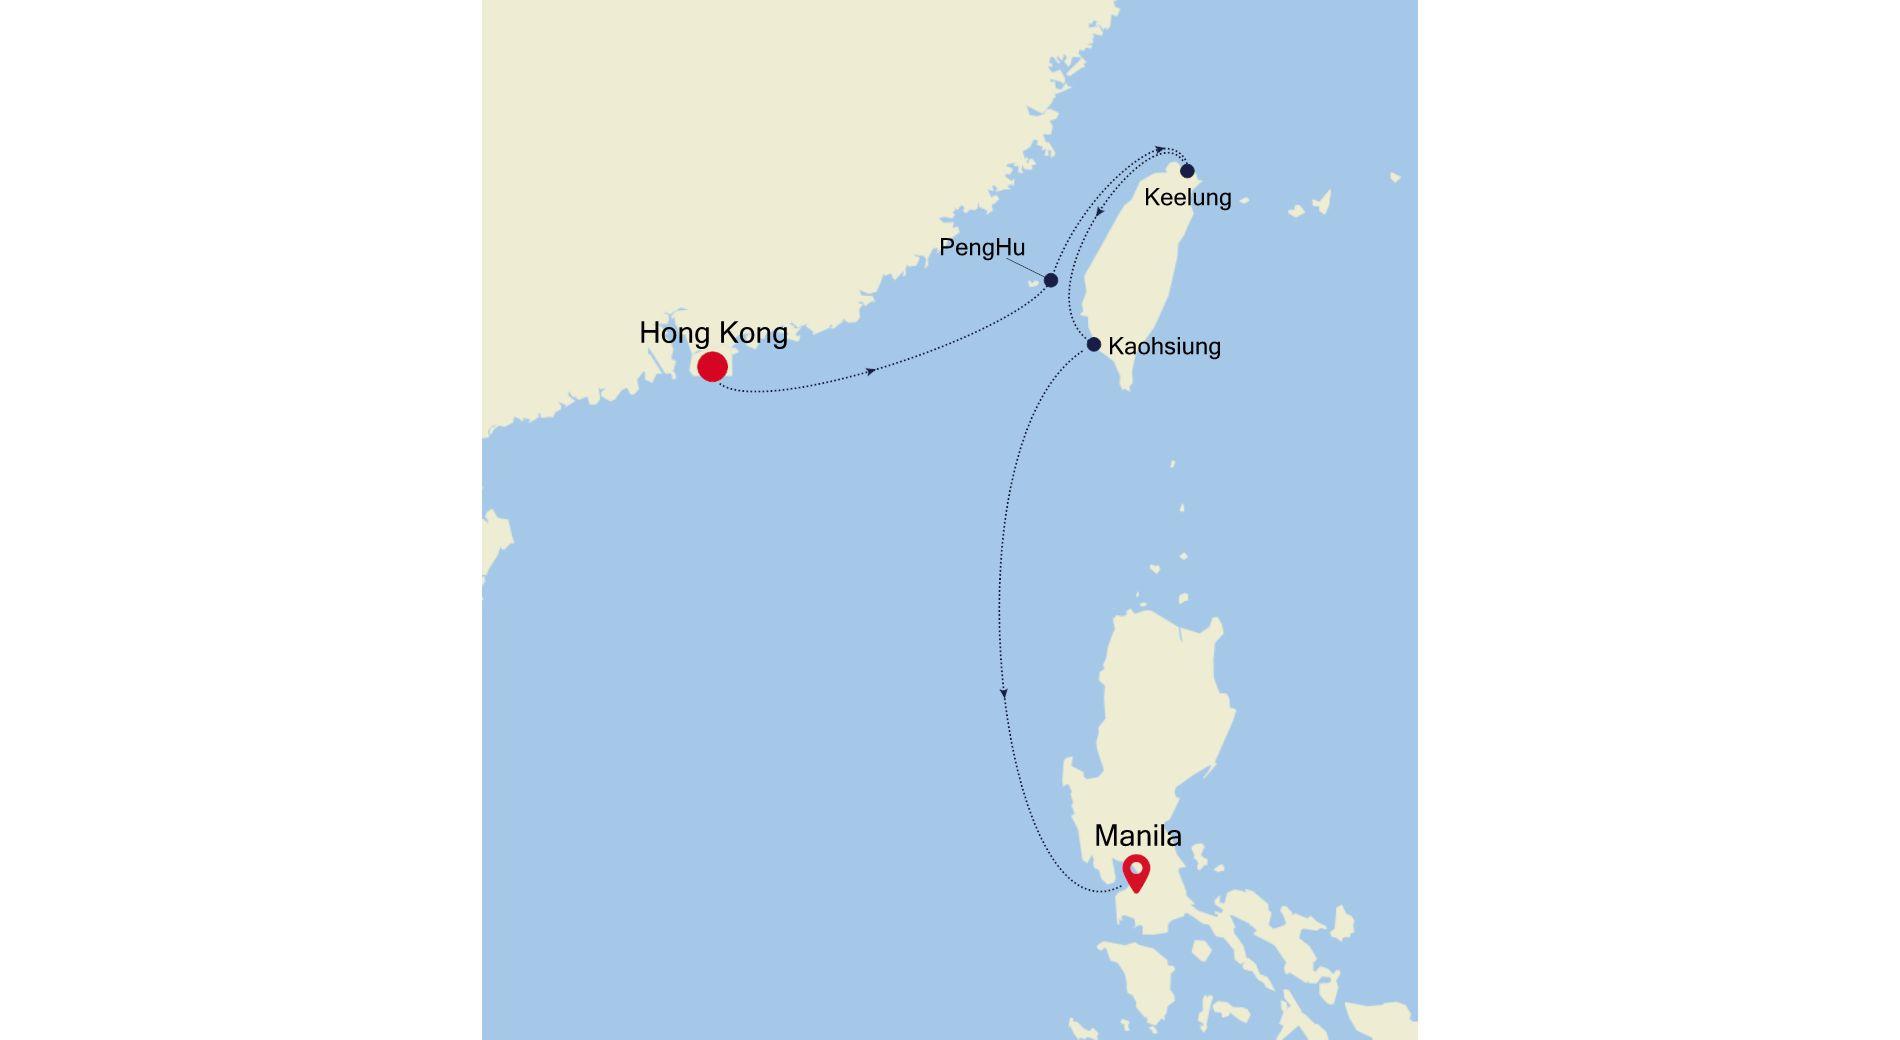 SL210104S06 - Hong Kong nach Manila